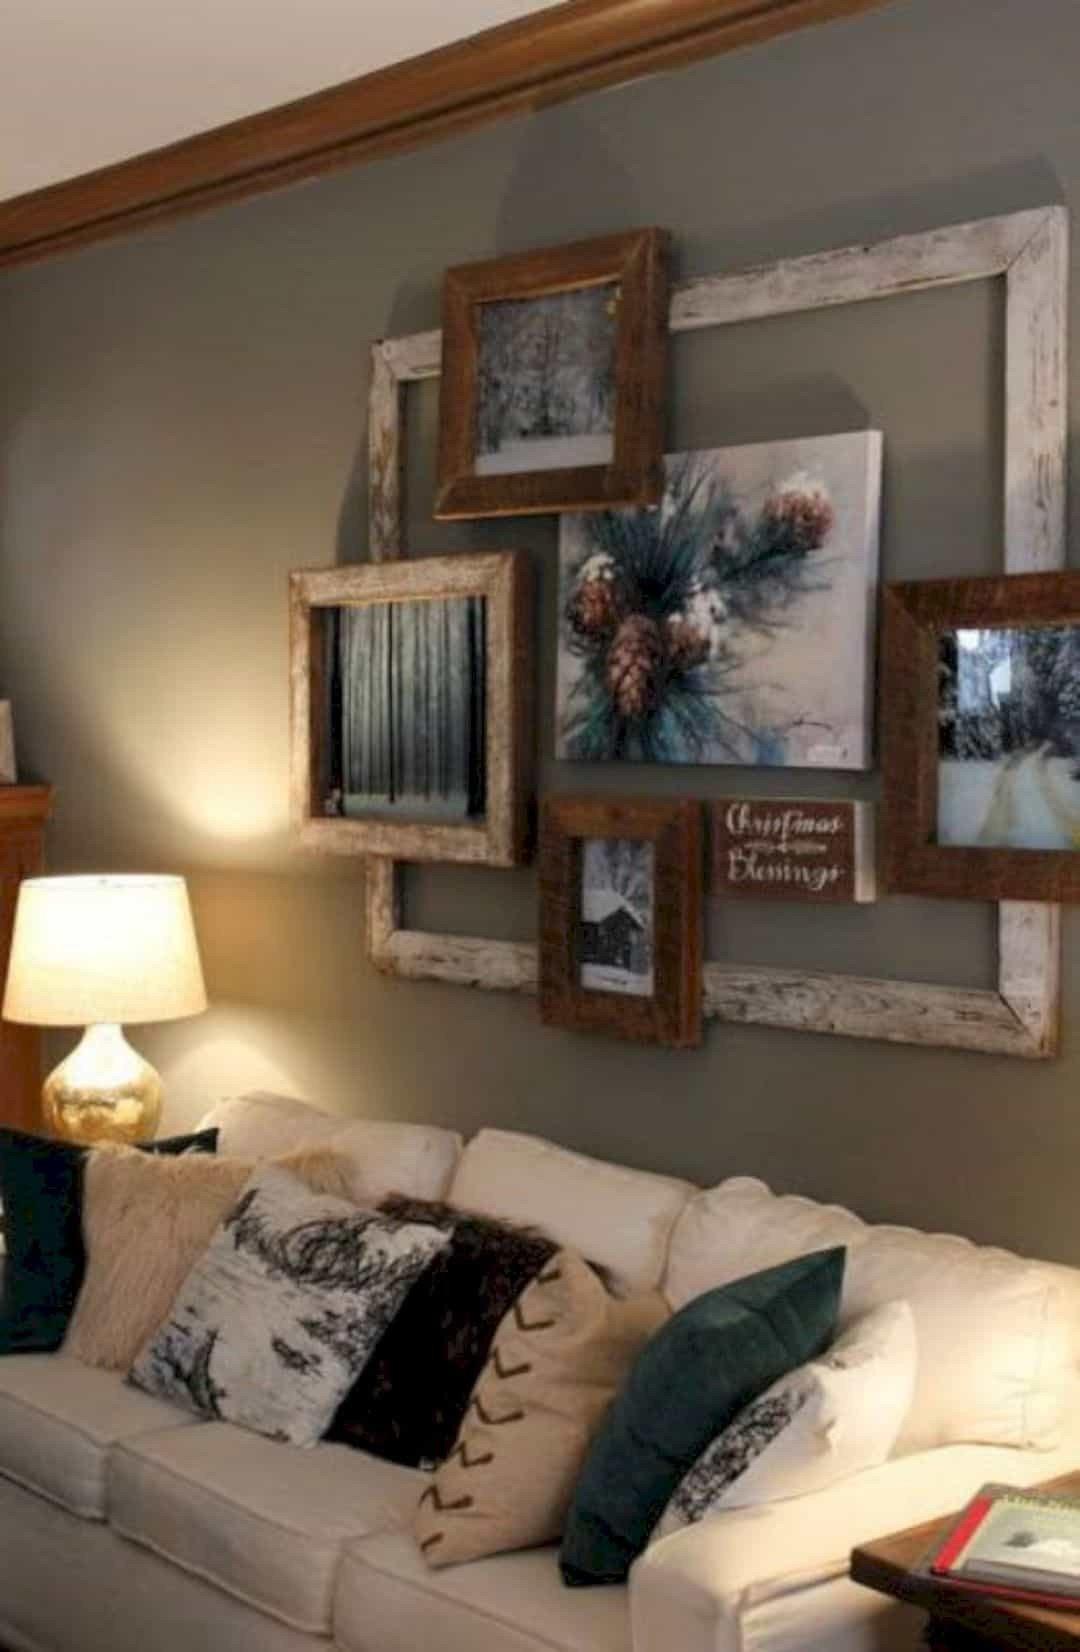 Diy Living Room Wall Decor Luxury 17 Diy Rustic Home Decor Ideas for Living Room